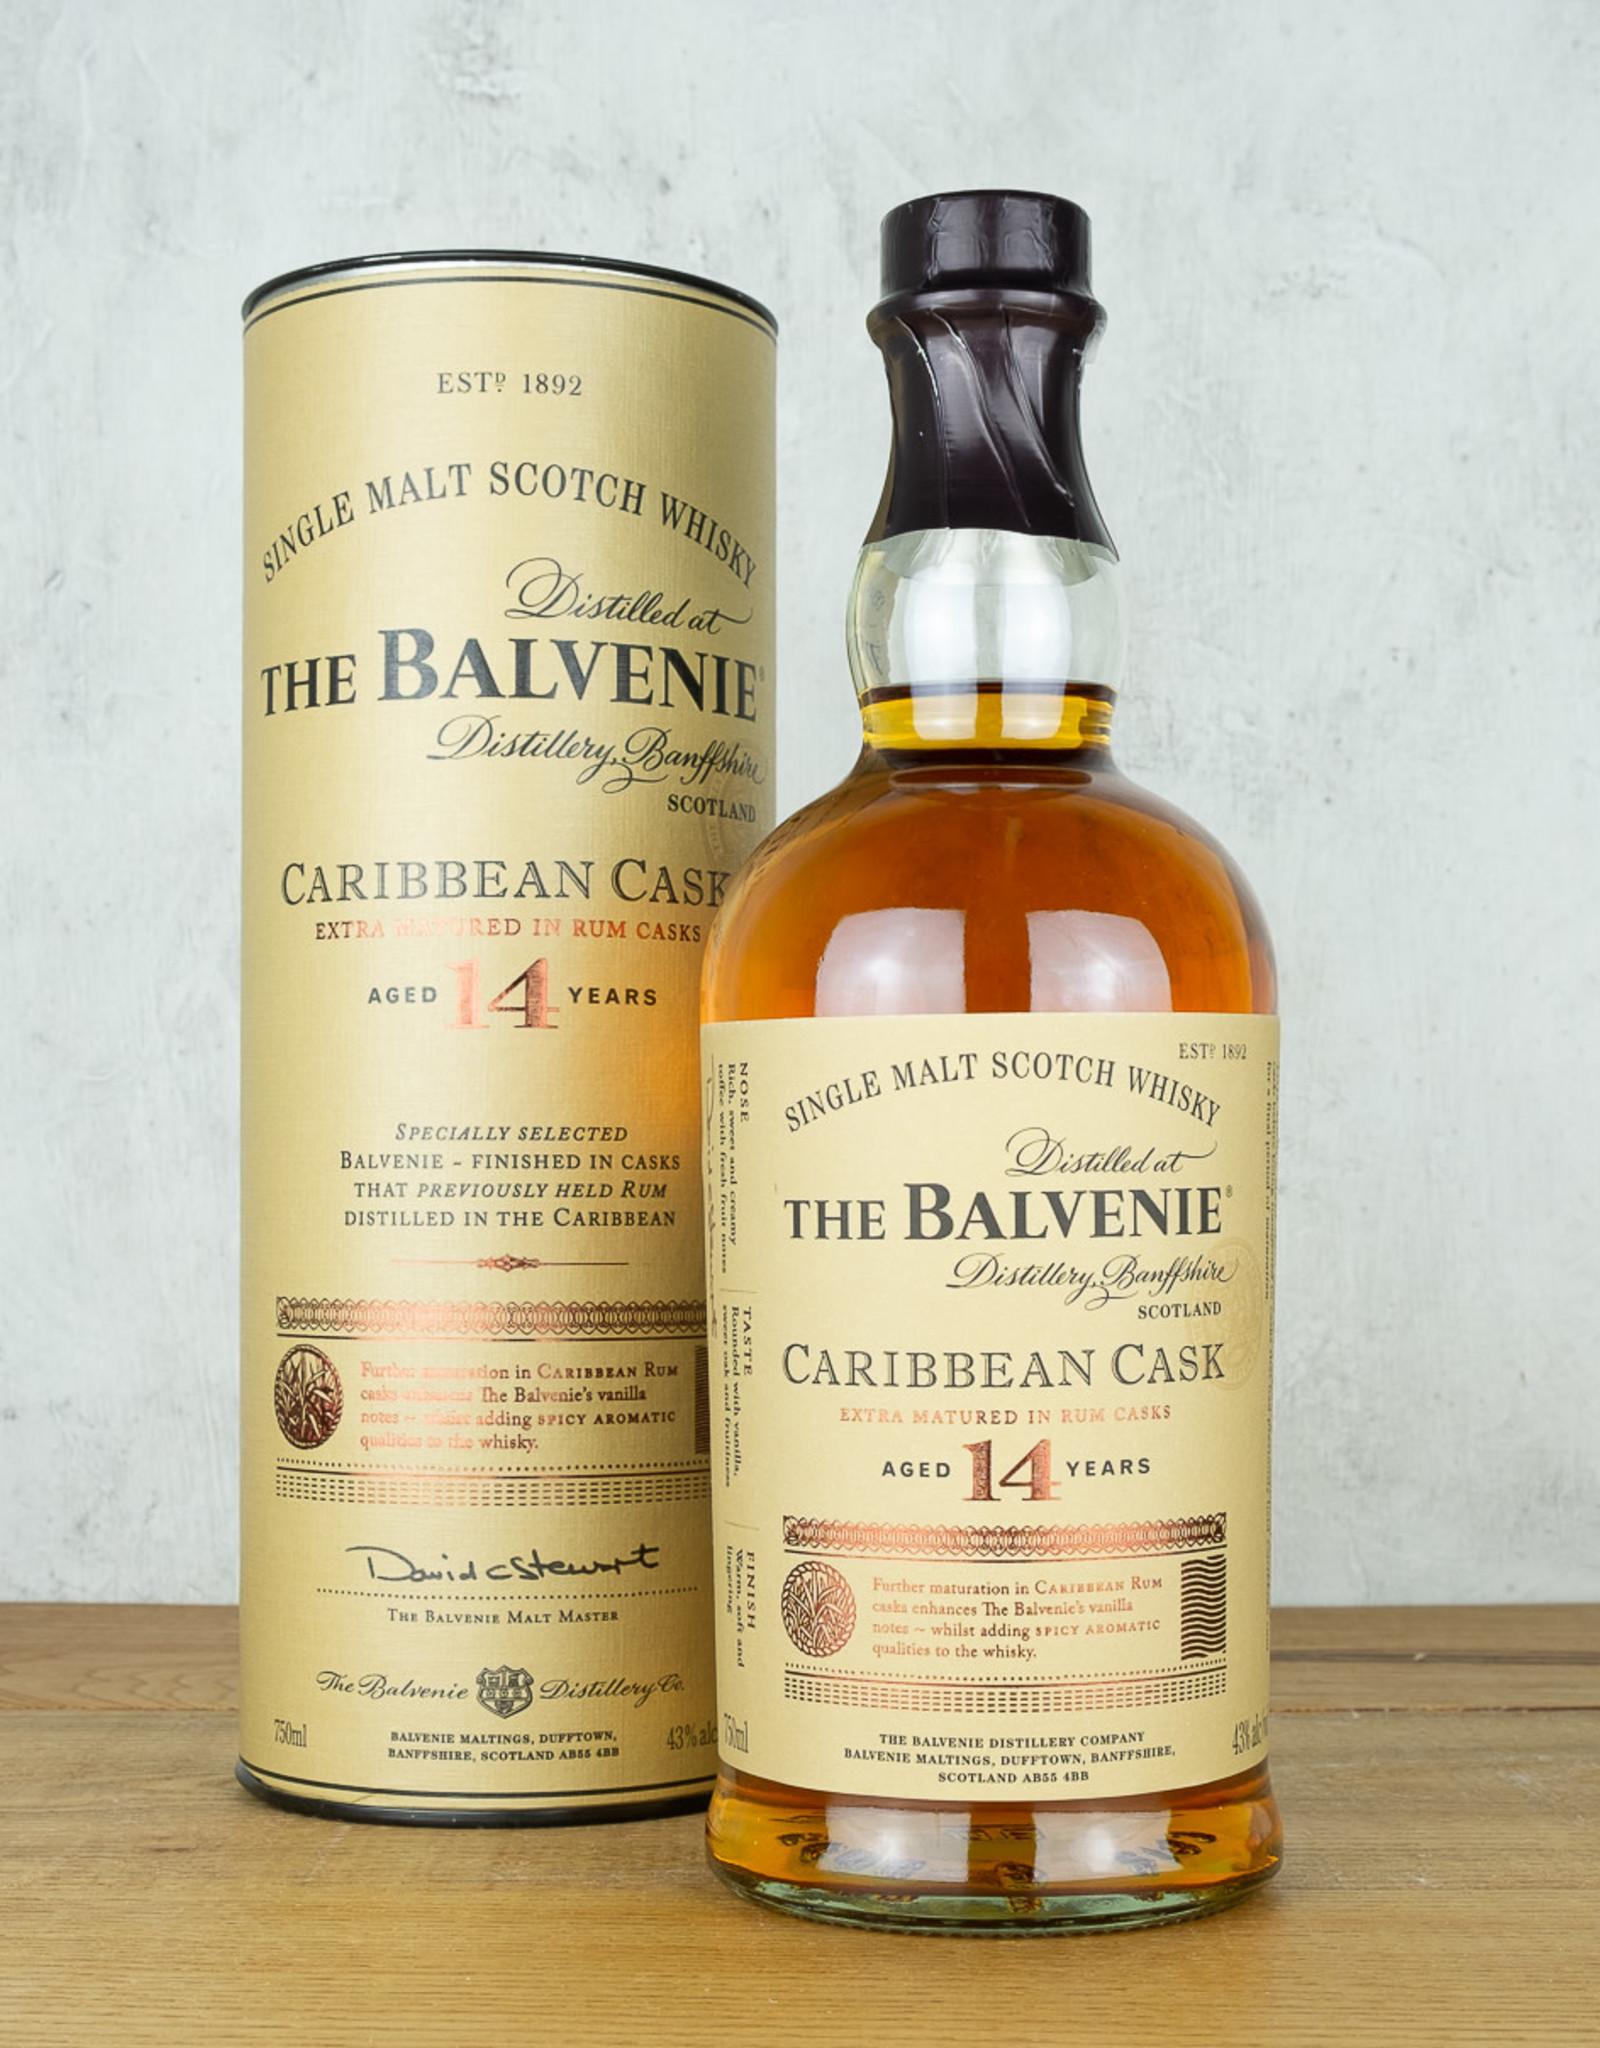 Balvenie 14 Year Caribbean Cask Single Malt Scotch Whisky